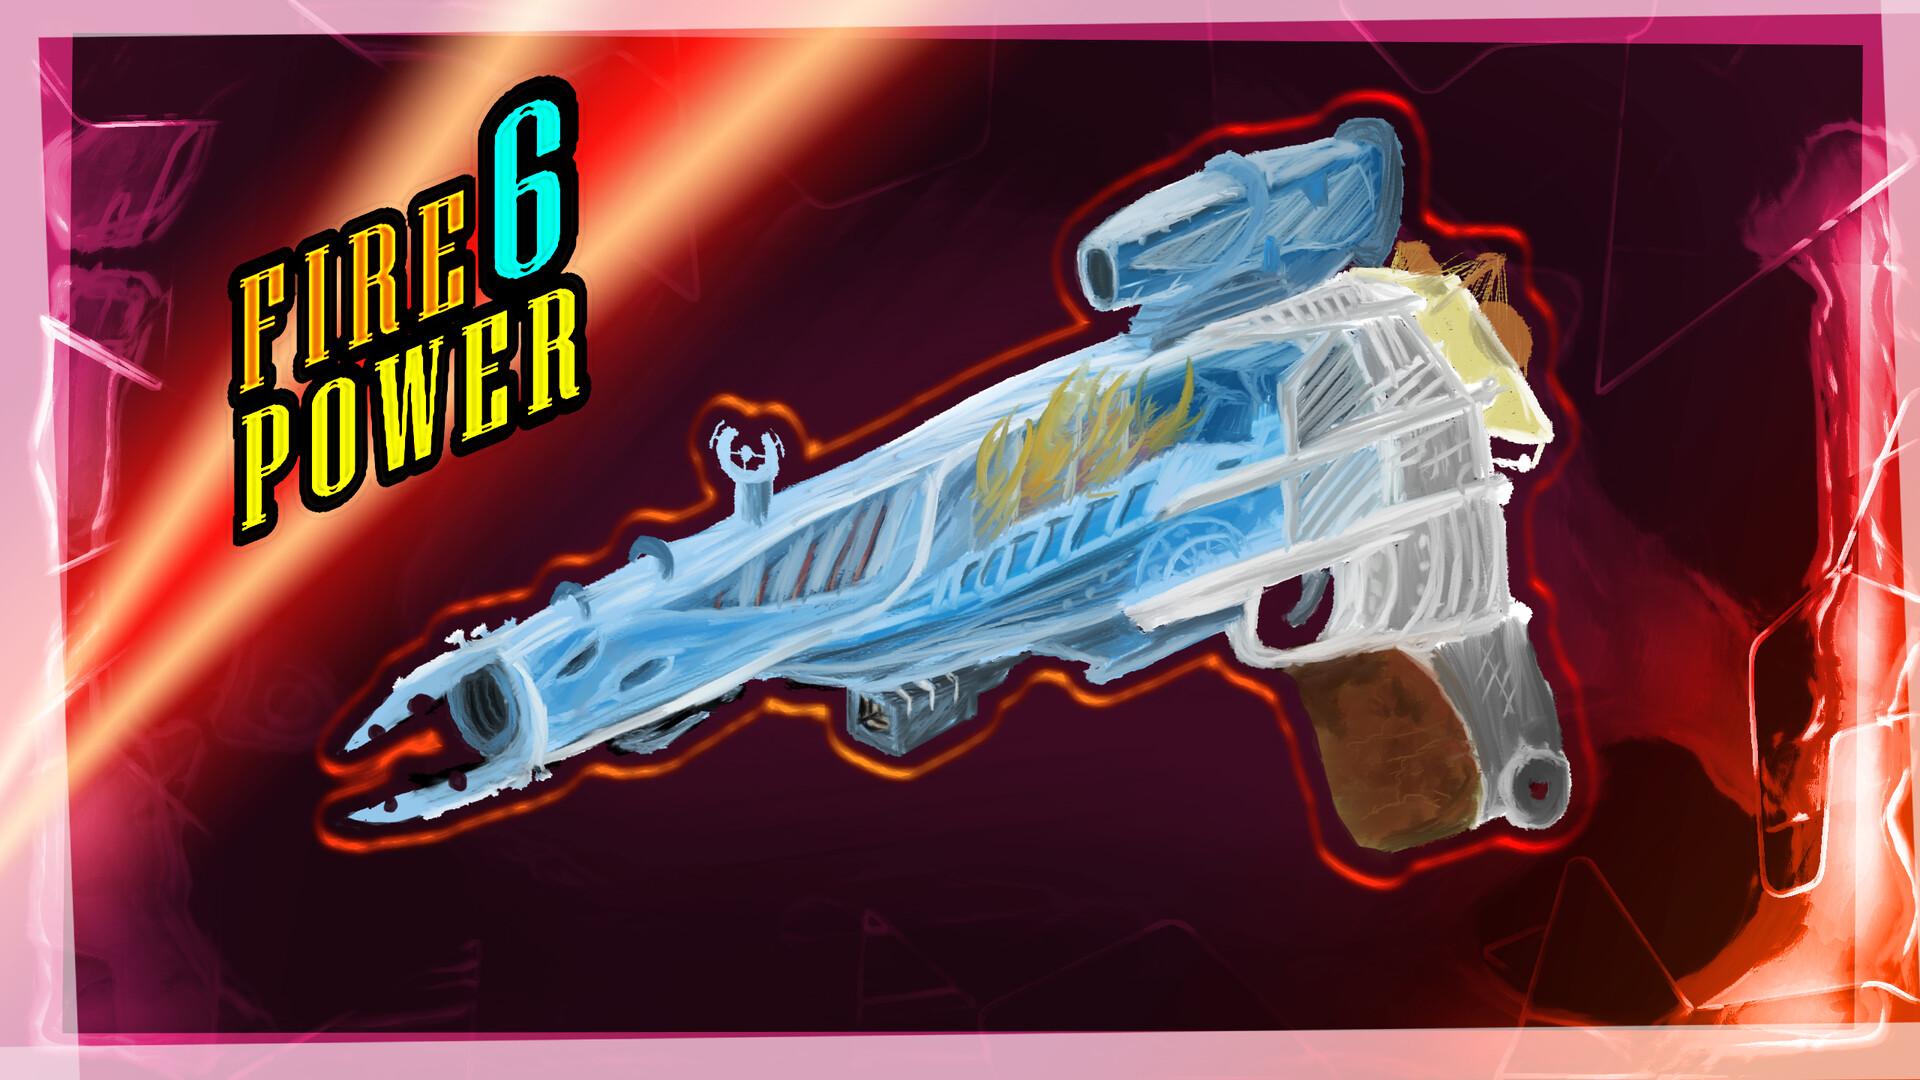 Alexander laheij alexander laheij firepower6